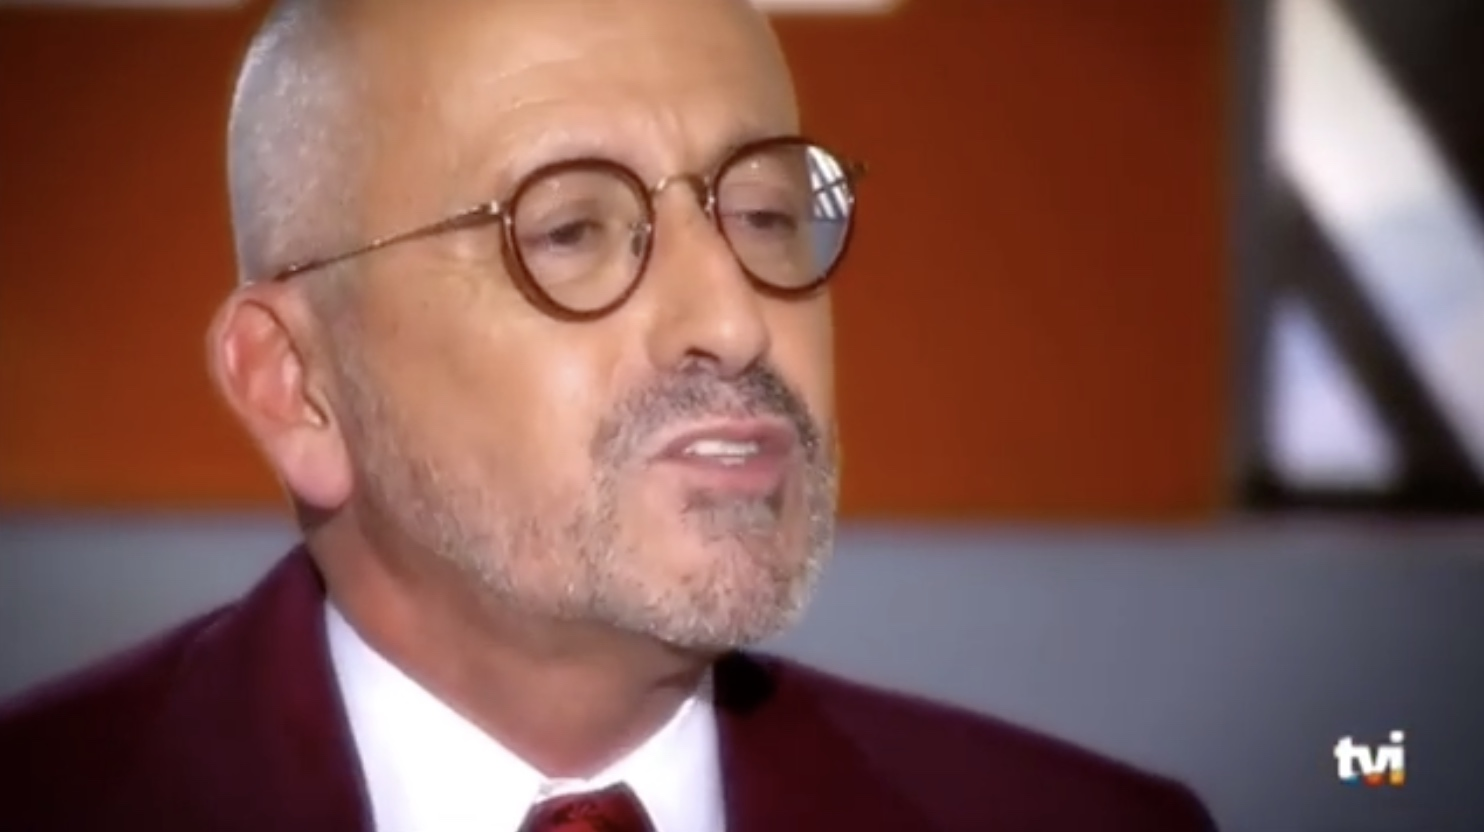 Manuel Luis Goucha 3 &Quot;Entrevista Do Ano&Quot;. Manuel Luís Goucha Revela Tudo A Fátima Lopes